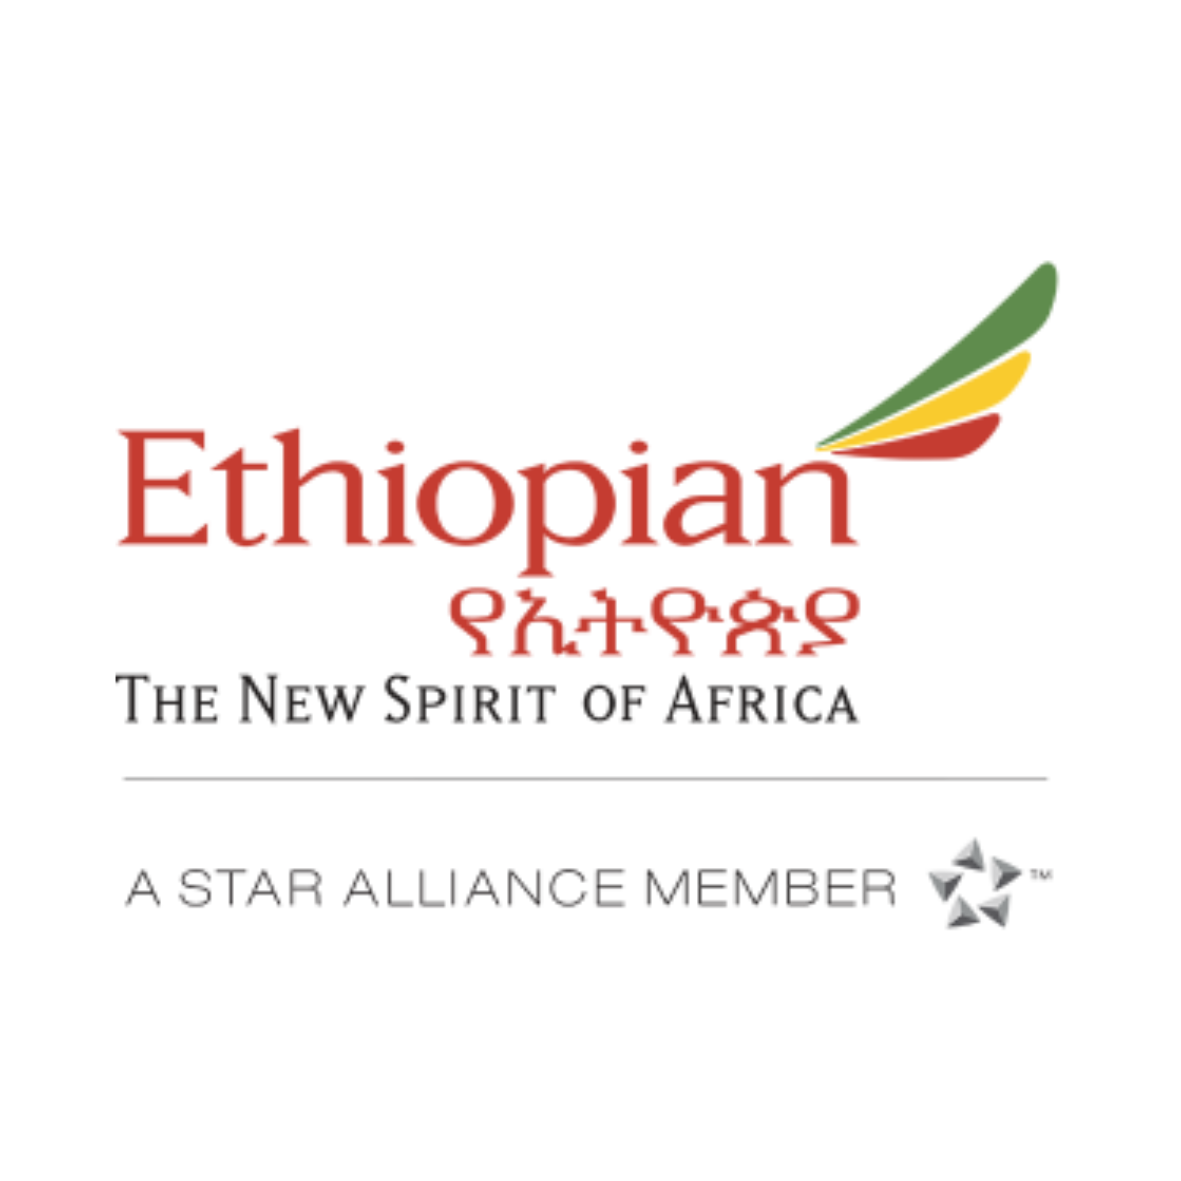 ethiopian cargo recognized at brussels airport aviation awards  u2013 embassy of ethiopia